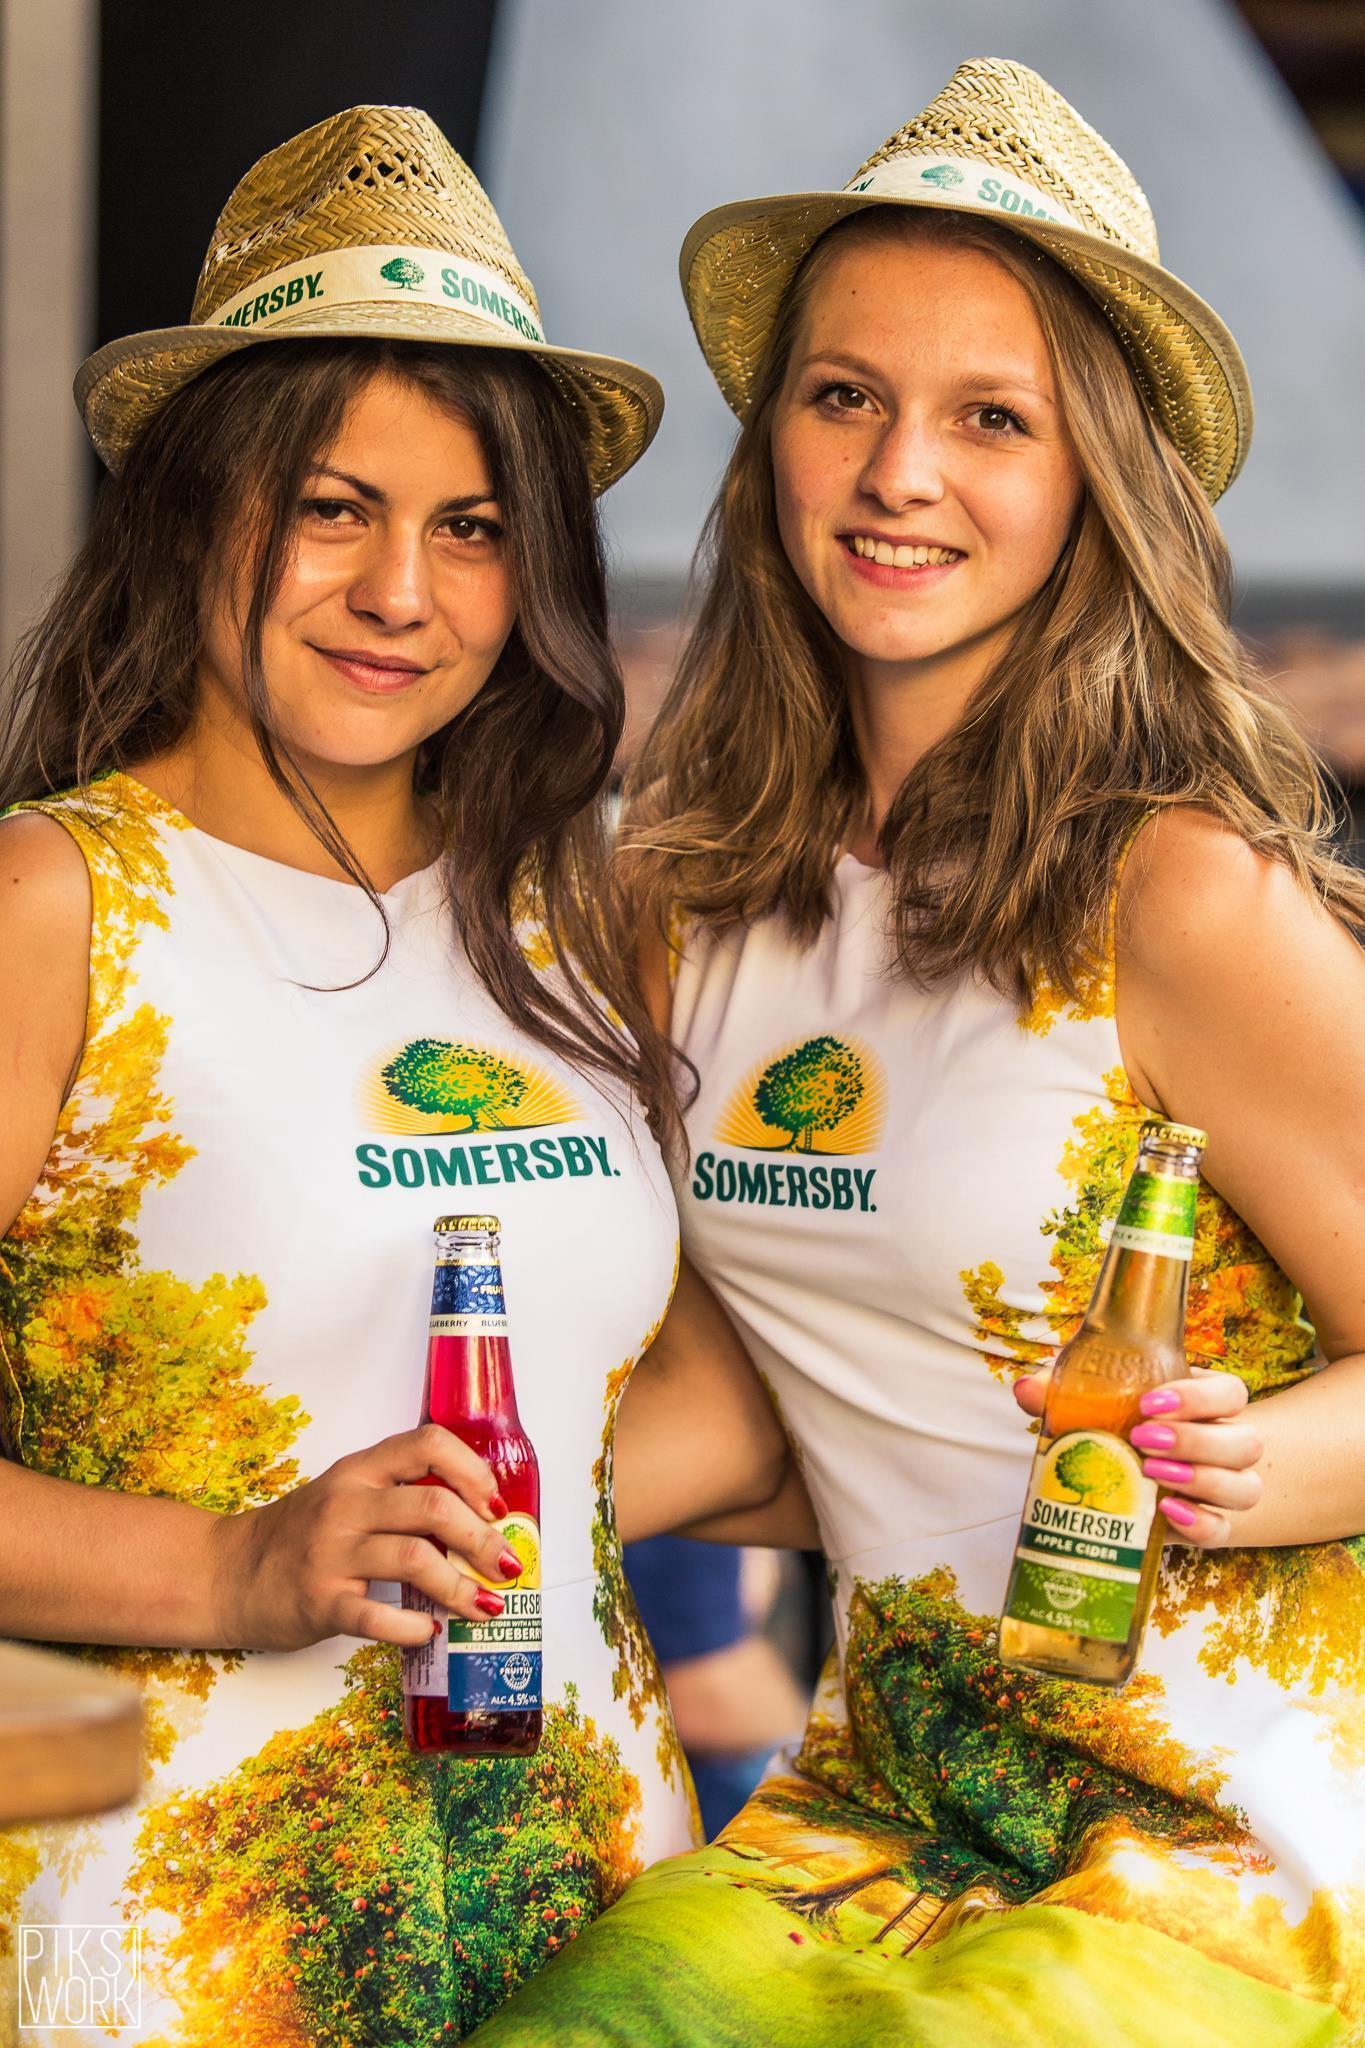 Somersby_3